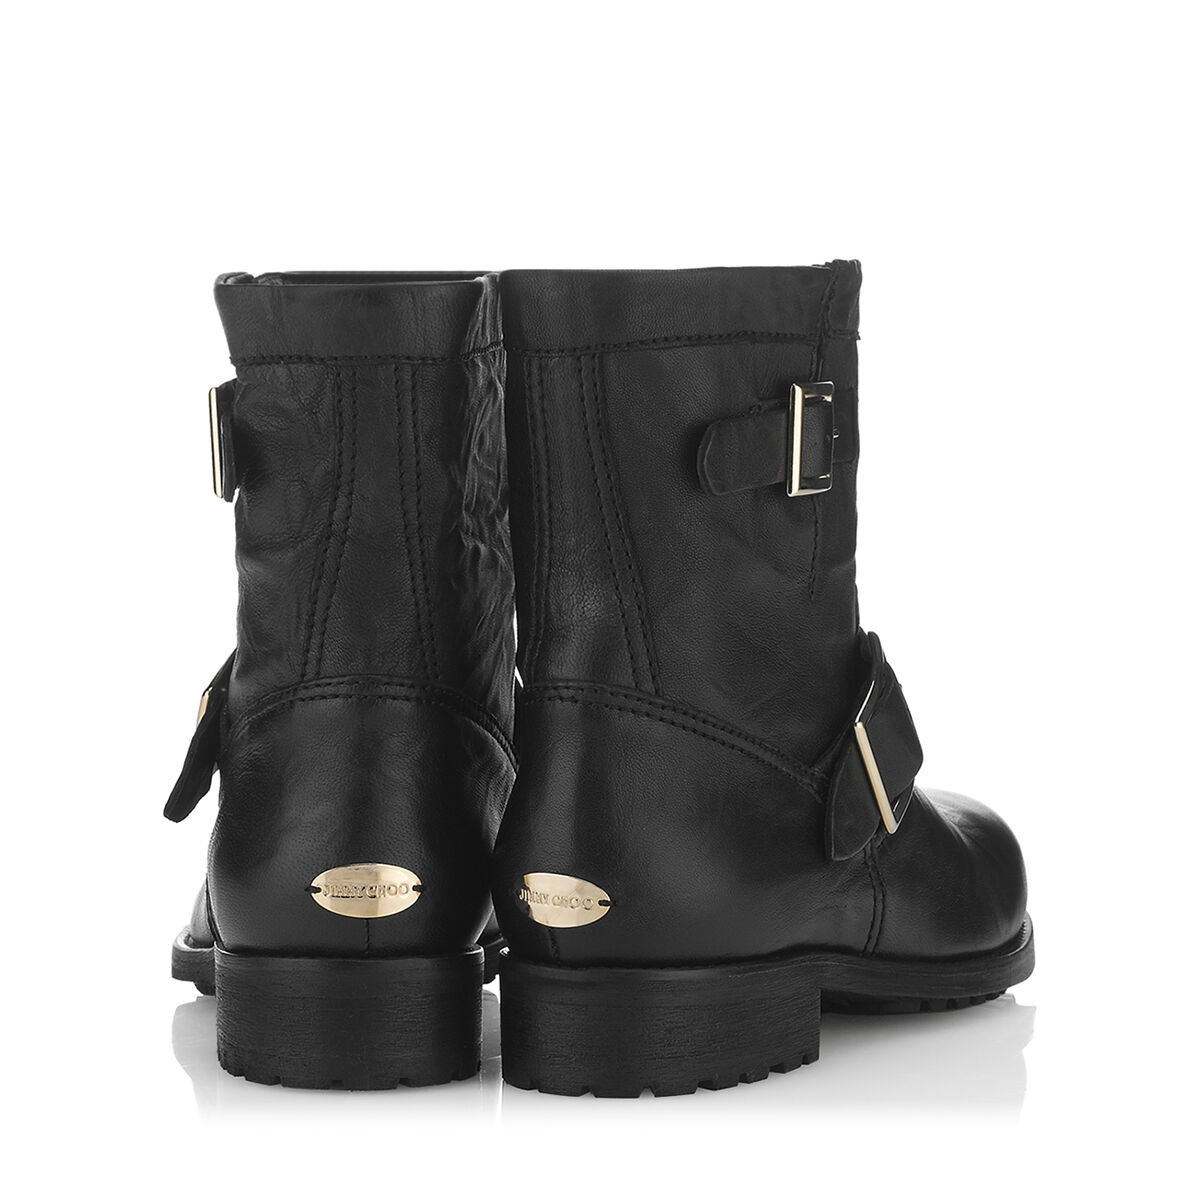 jimmy choo replica boots cheap simply accessories rh simplyaccessories com